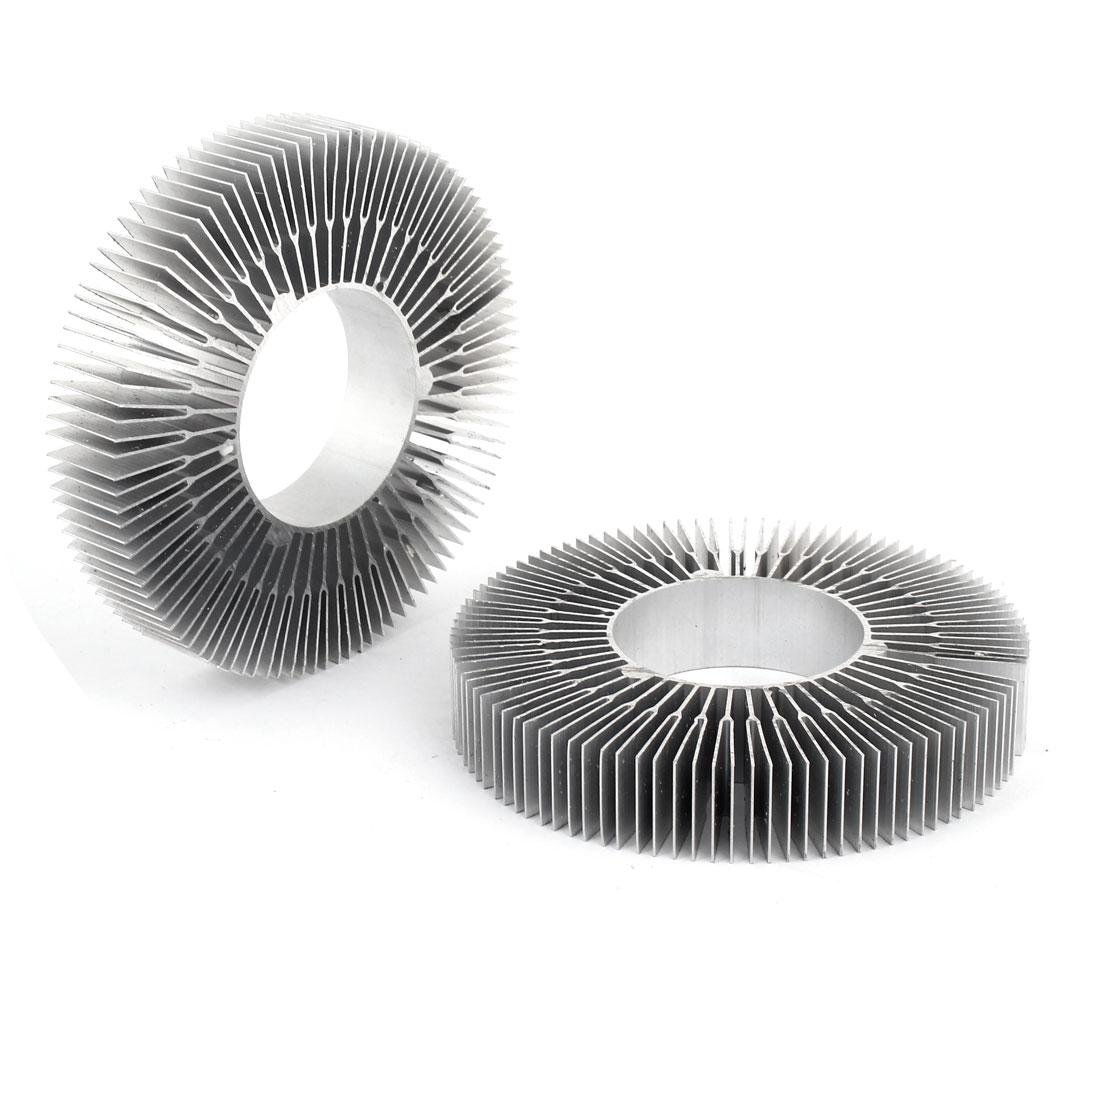 Cylindrical 115mmx50mmx20mm LED Ceiling Lights Heatsink Cooling Fin 2 PCS